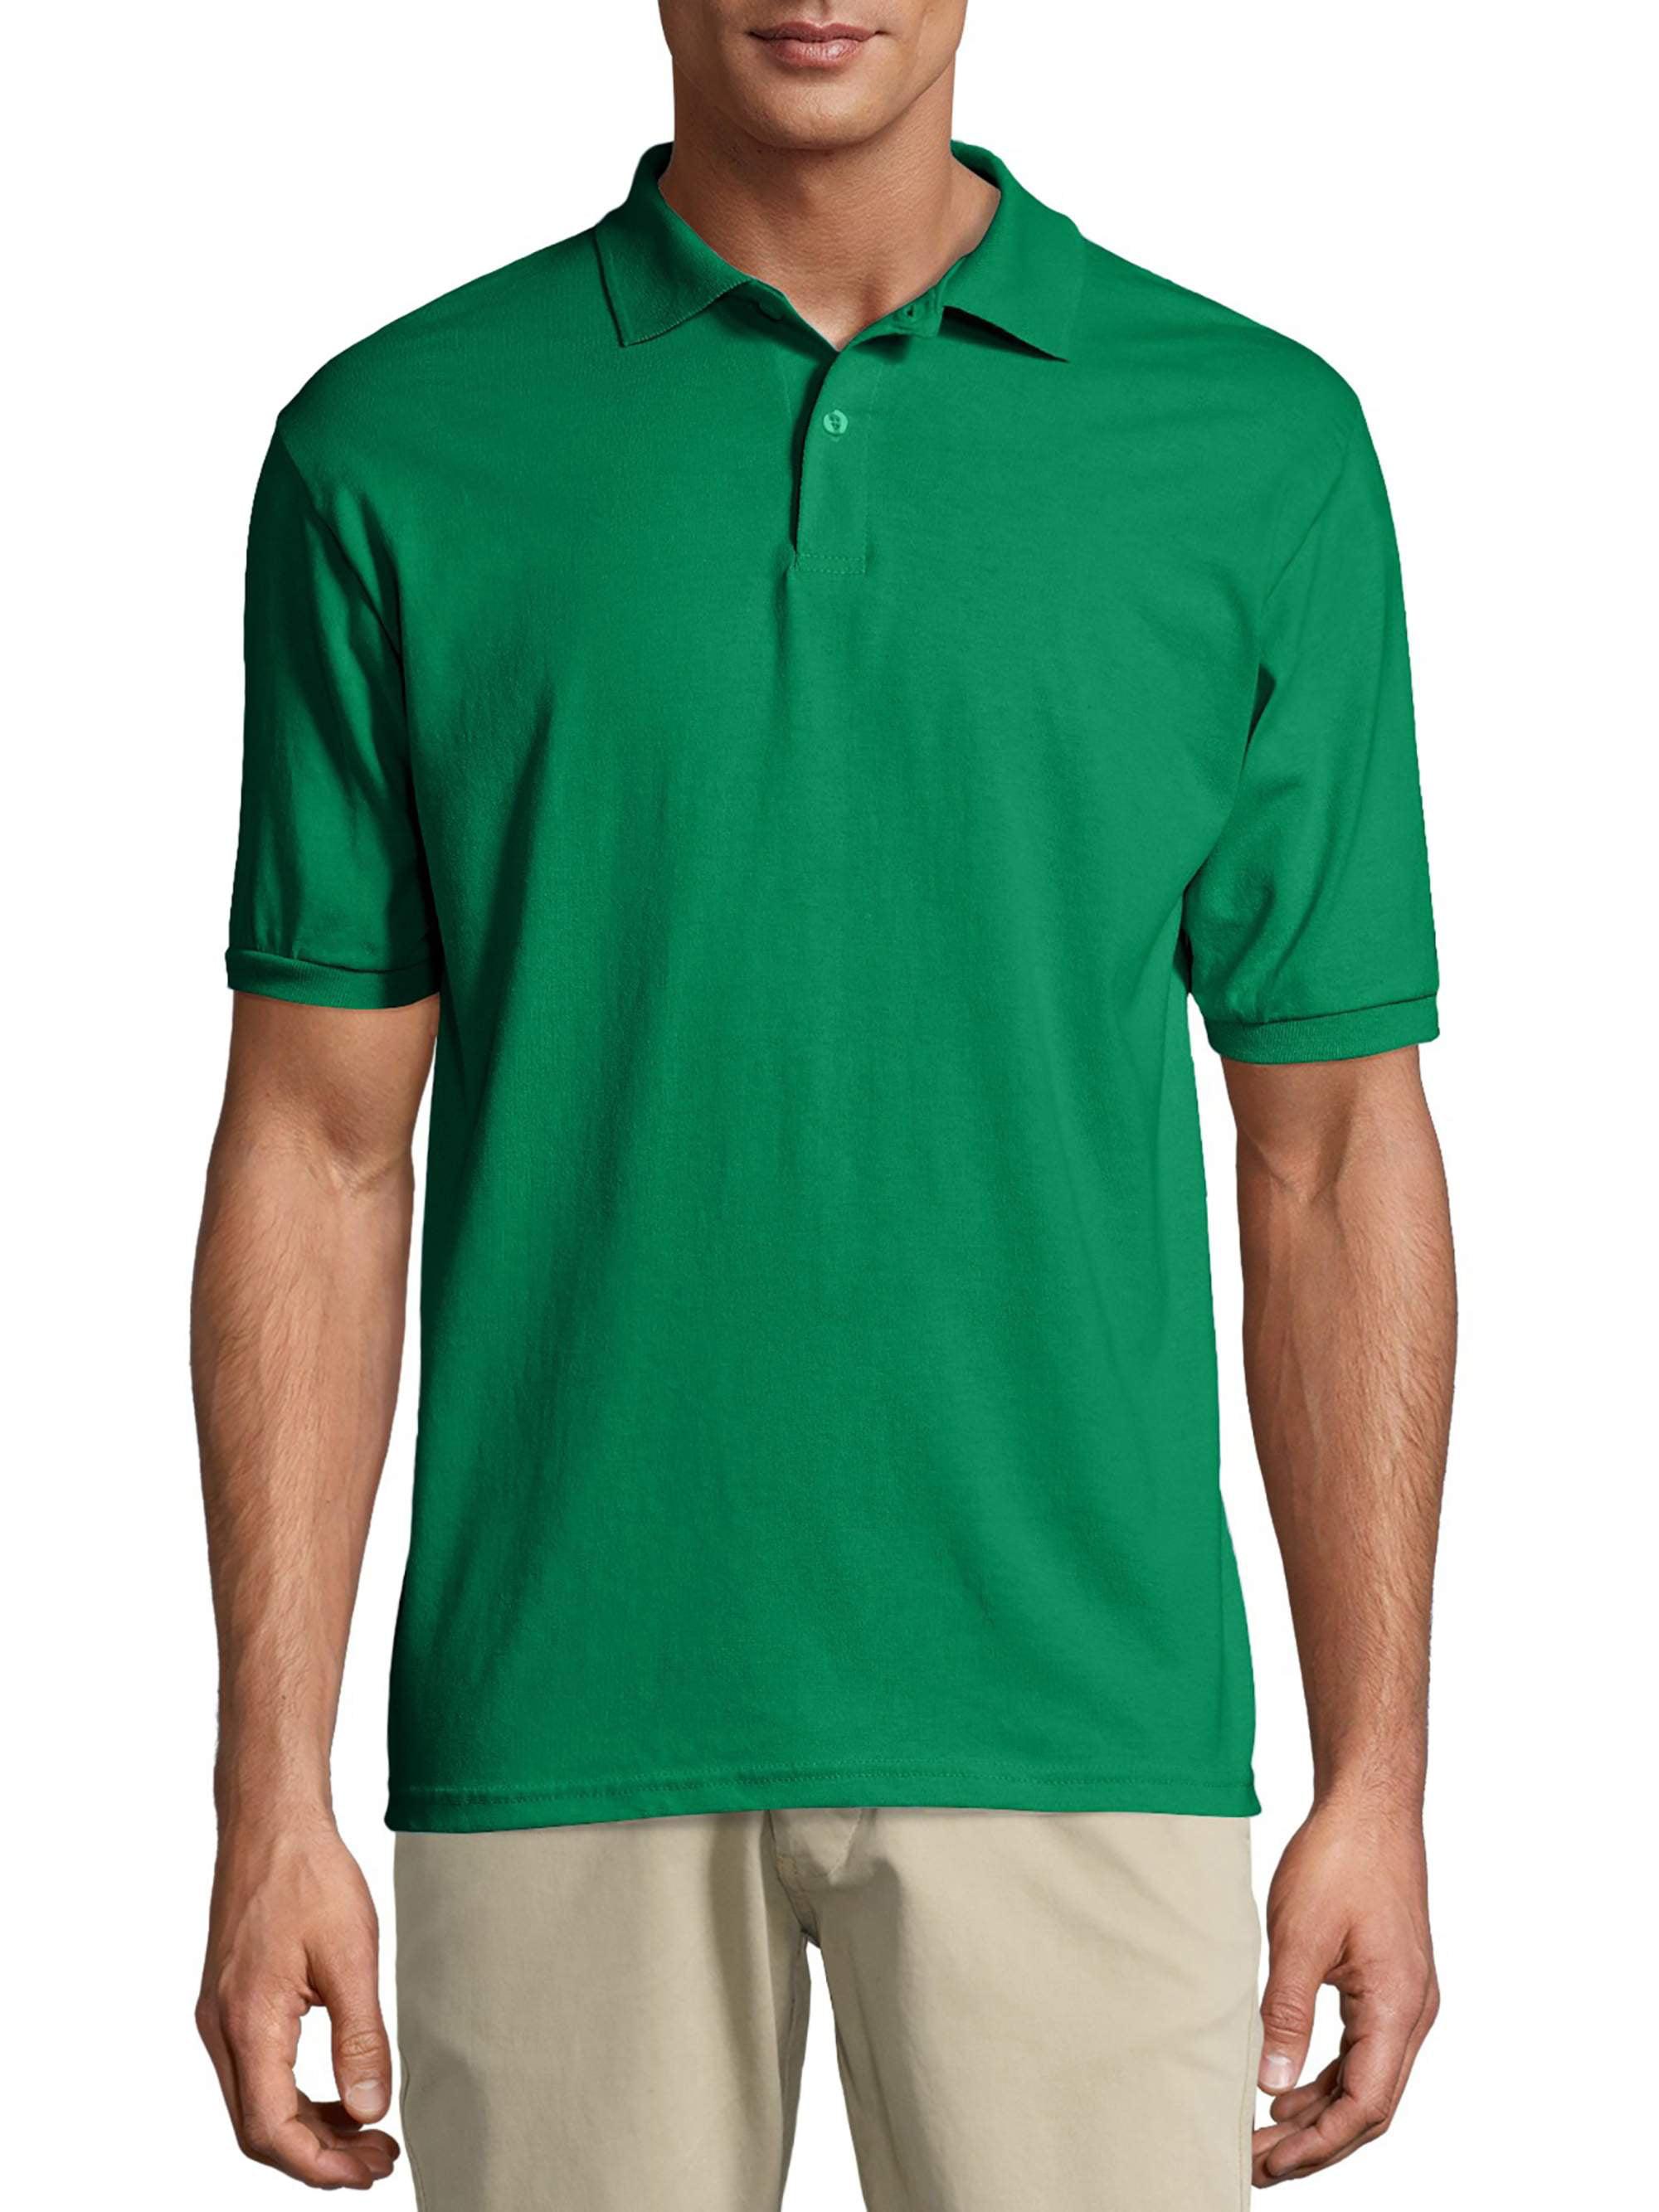 PARAGON Men/'s Short Sleeve Horizontal Tonal Texture Jersey Polo 115 New!!